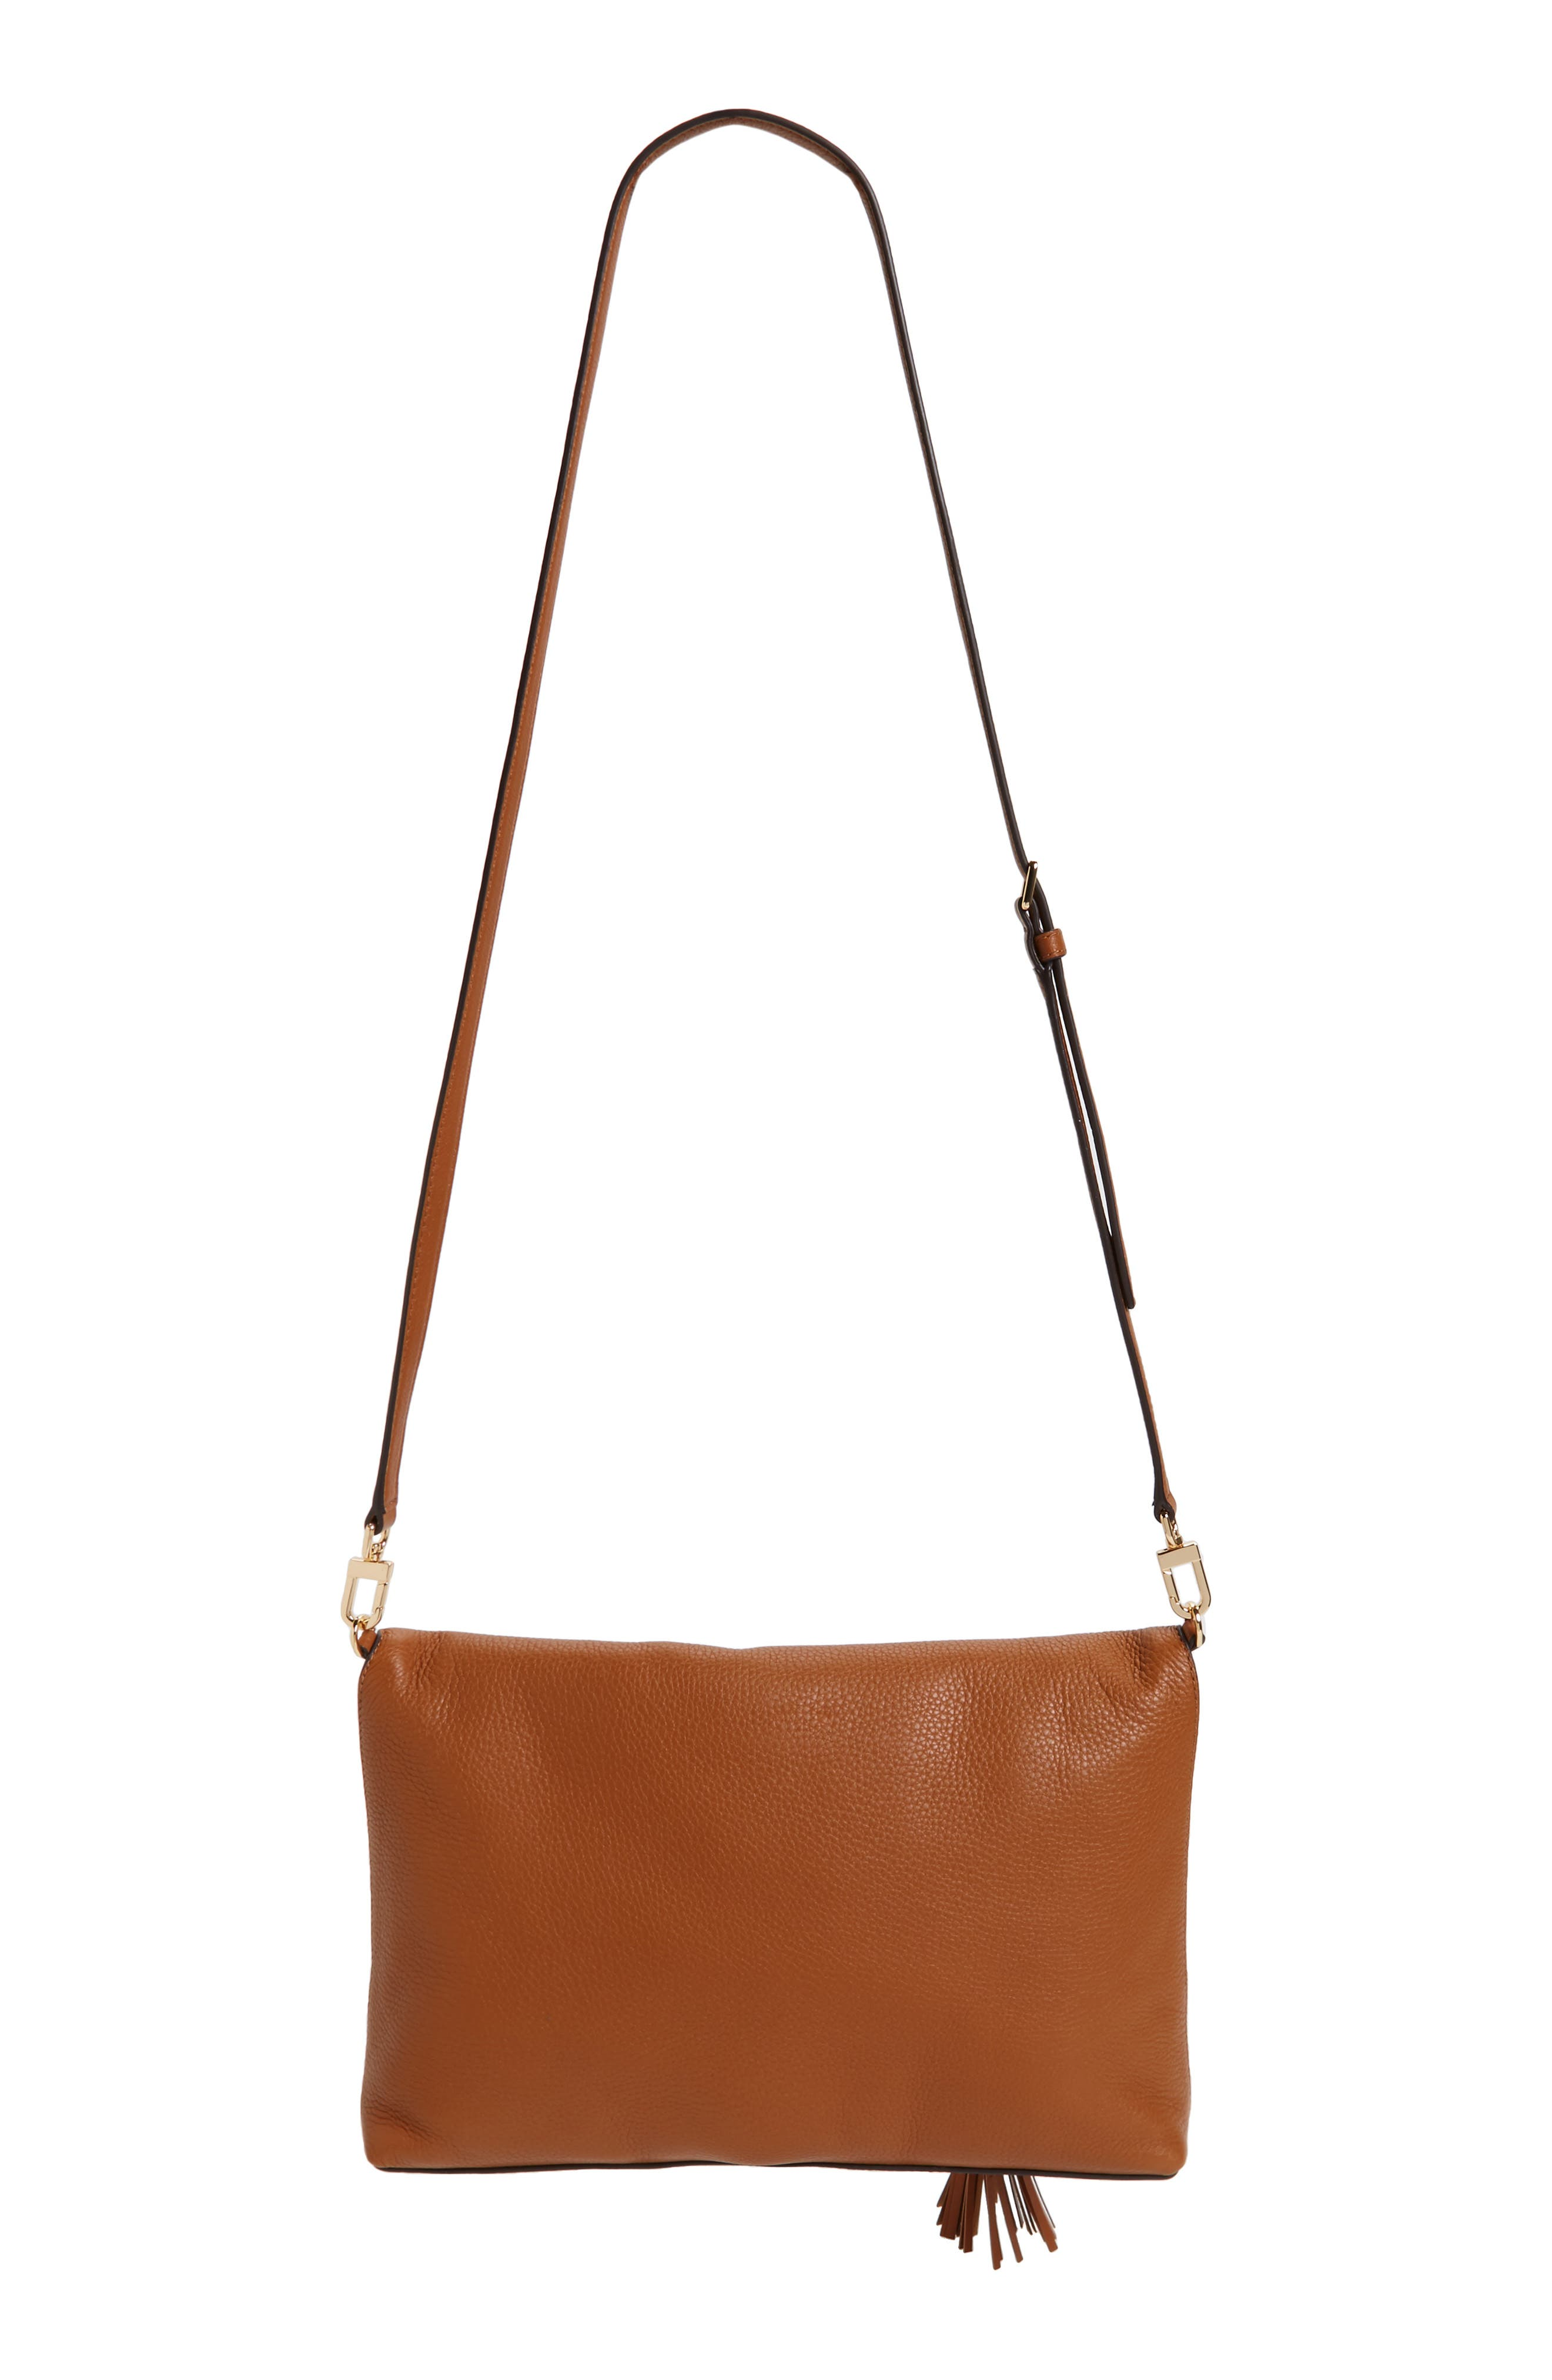 Convertible Leather Crossbody Bag,                             Alternate thumbnail 3, color,                             Saddle